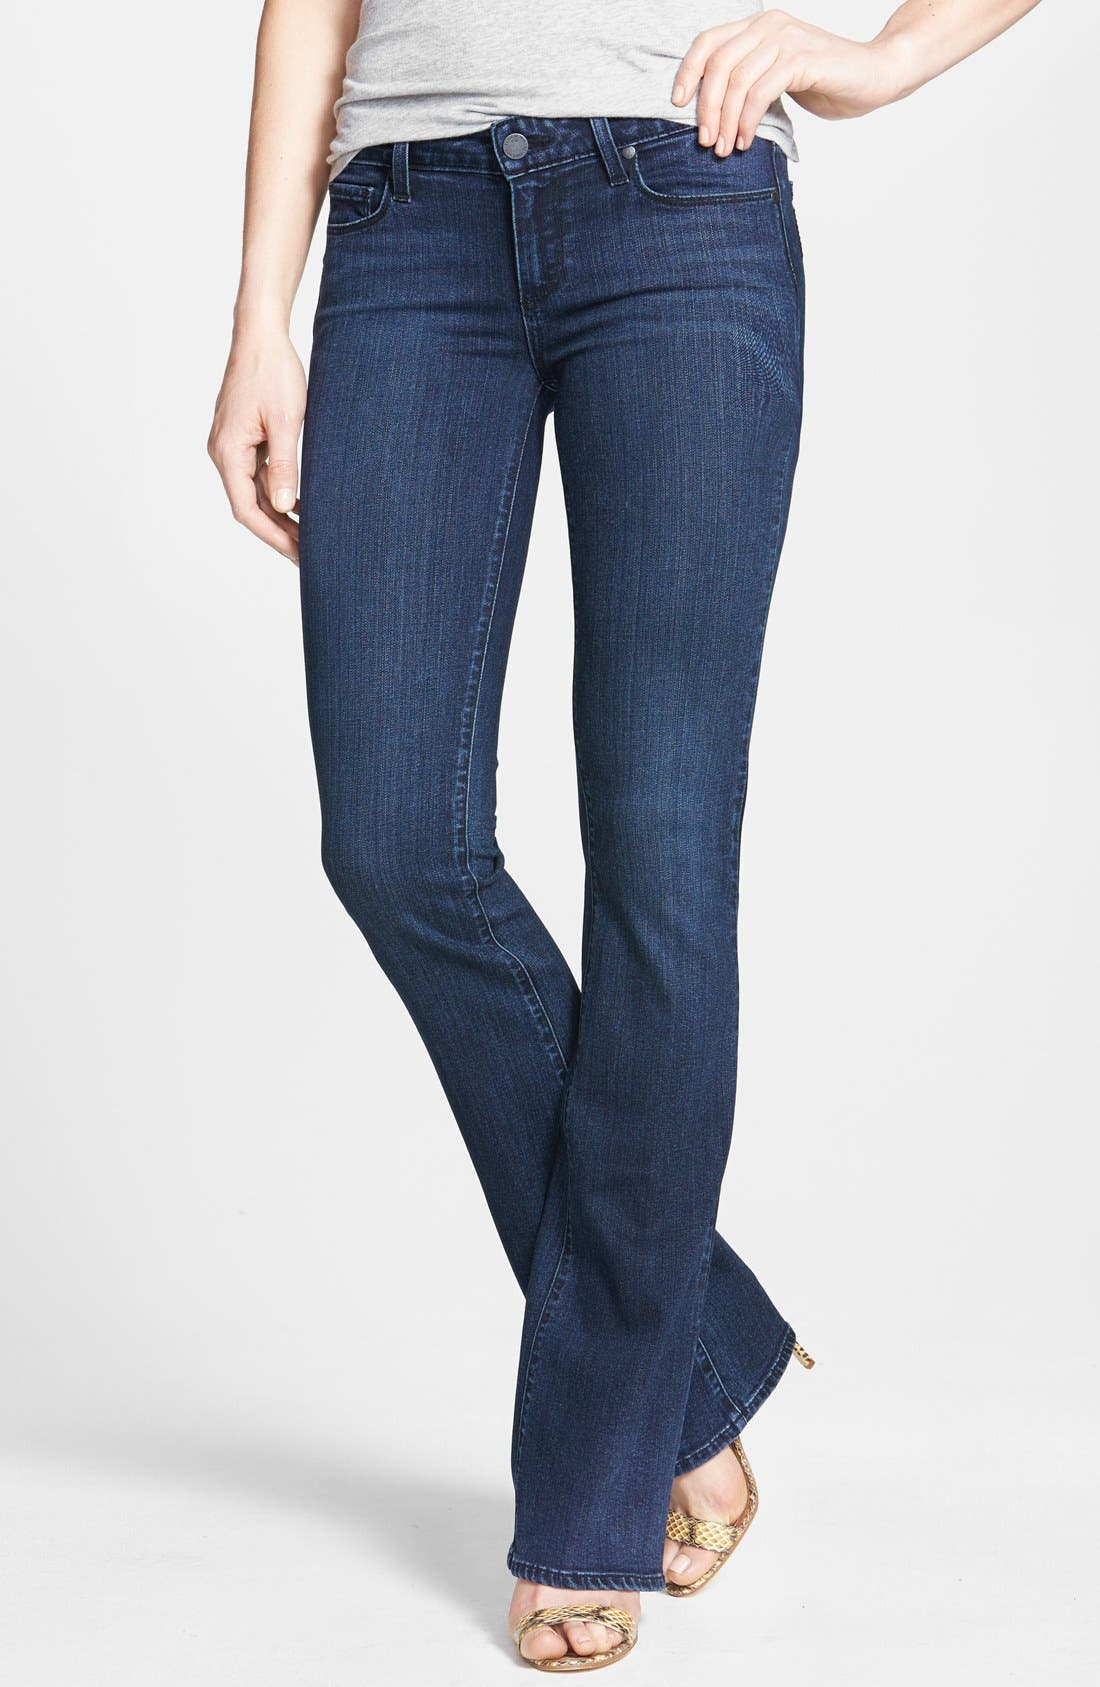 Alternate Image 1 Selected - PAIGE Transcend - Skyline Bootcut Jeans (Valor)